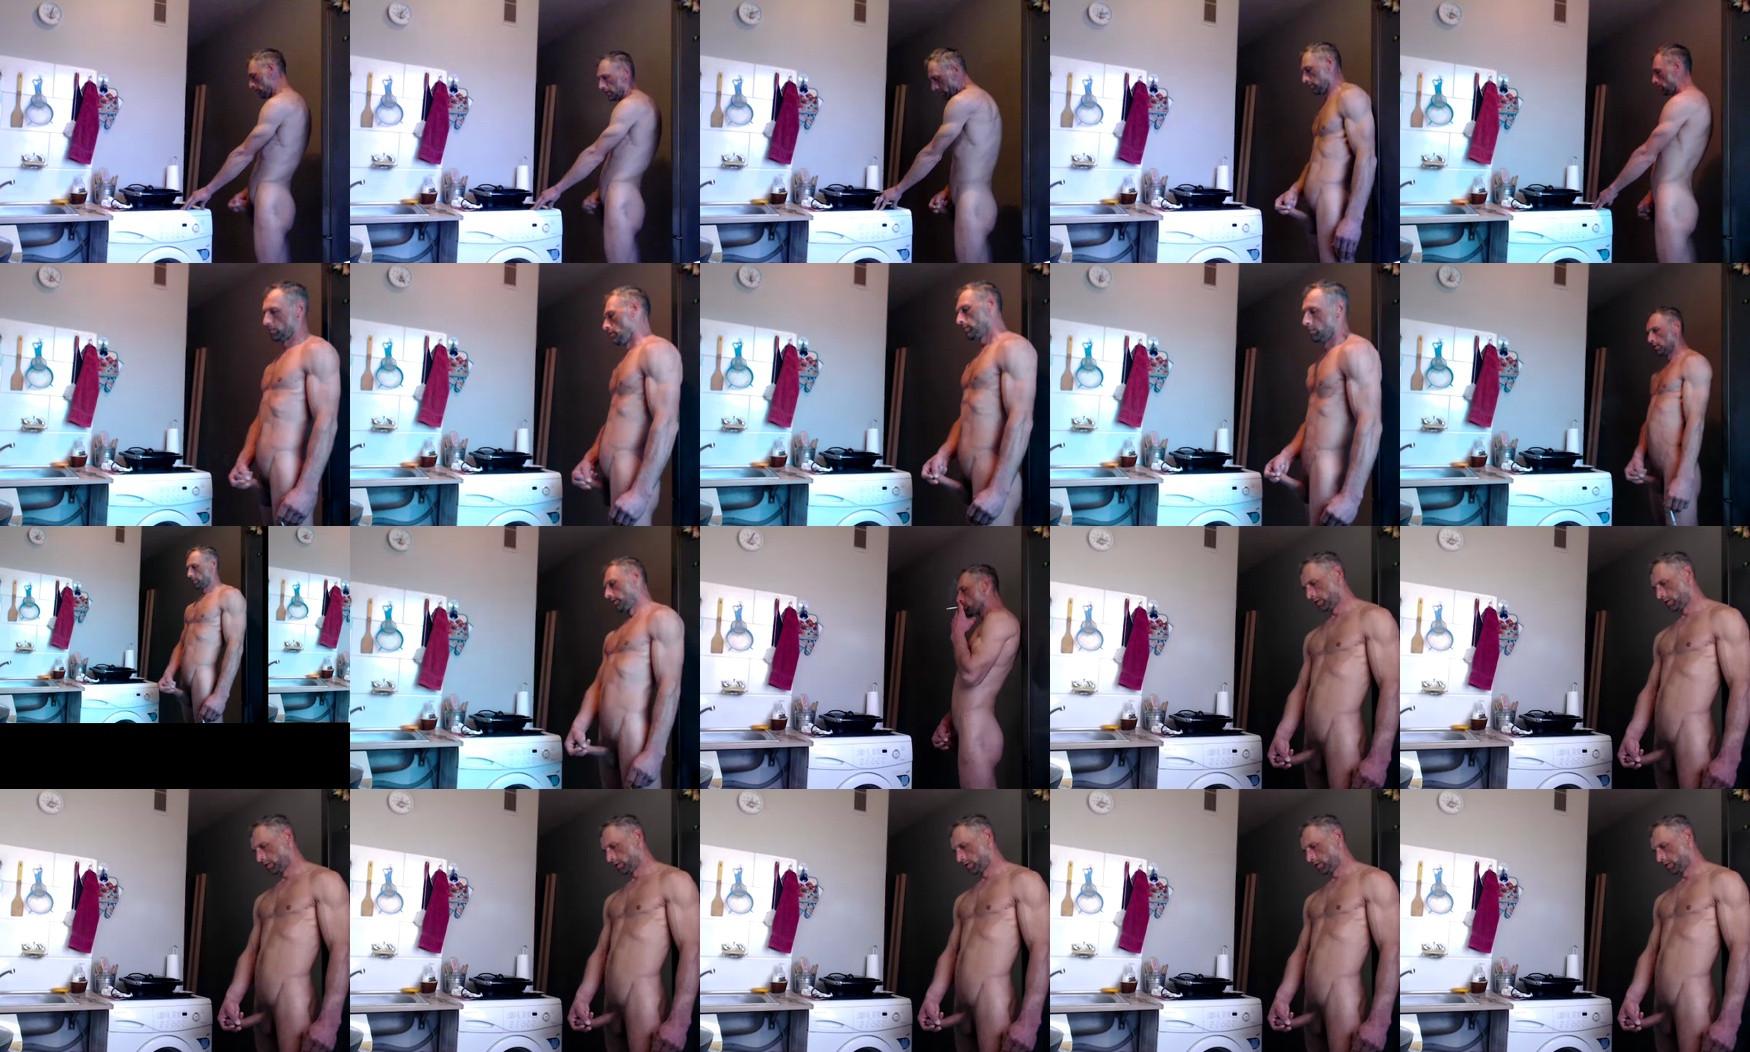 Jackmeljackee Cam4 04-05-2021 Recorded Video Cam